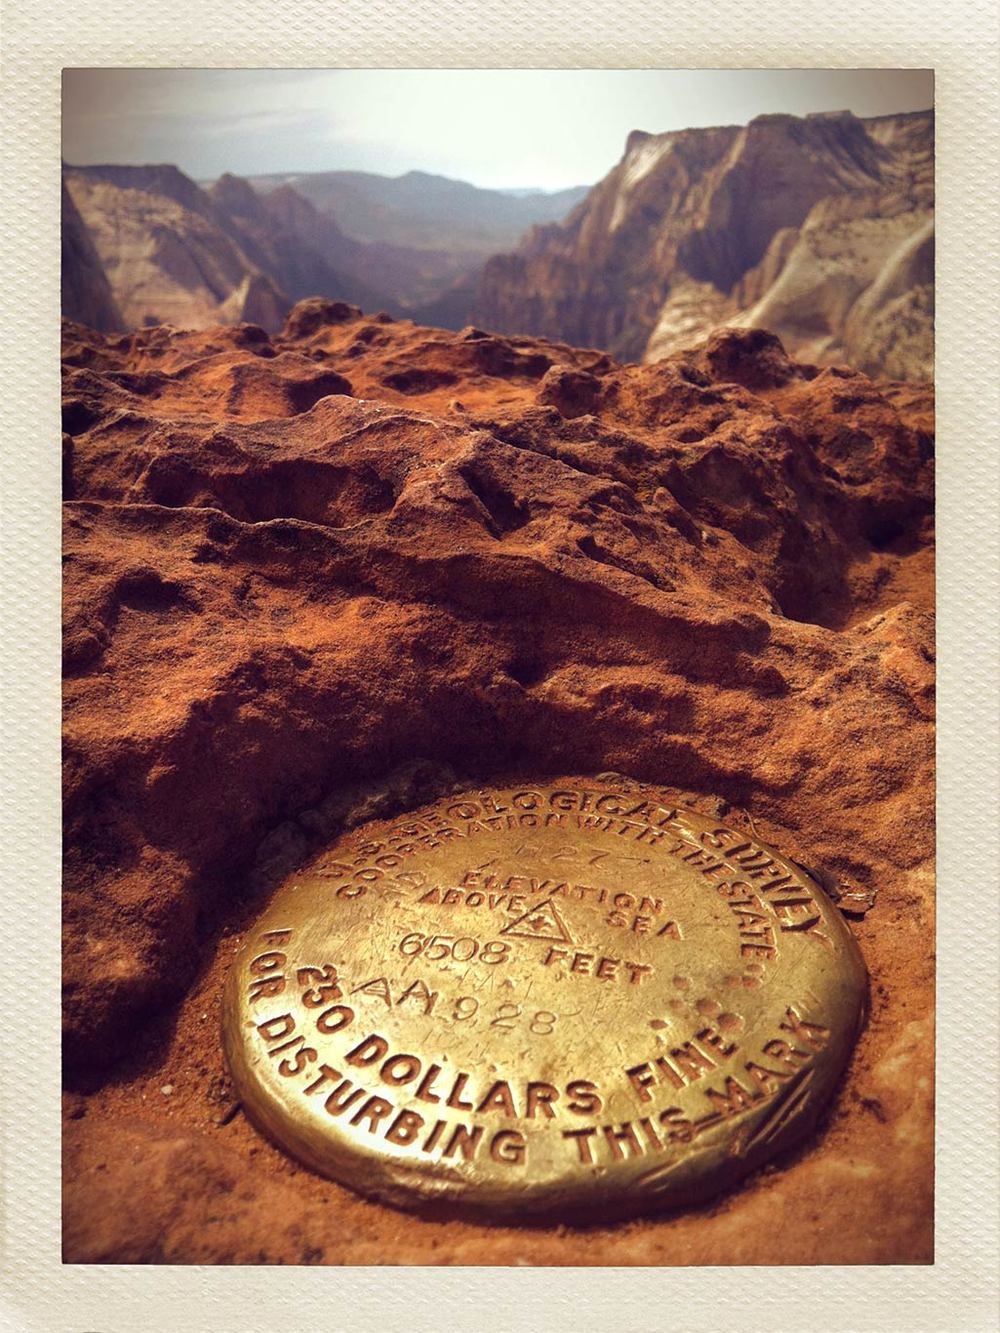 6,508 Feet, Zion